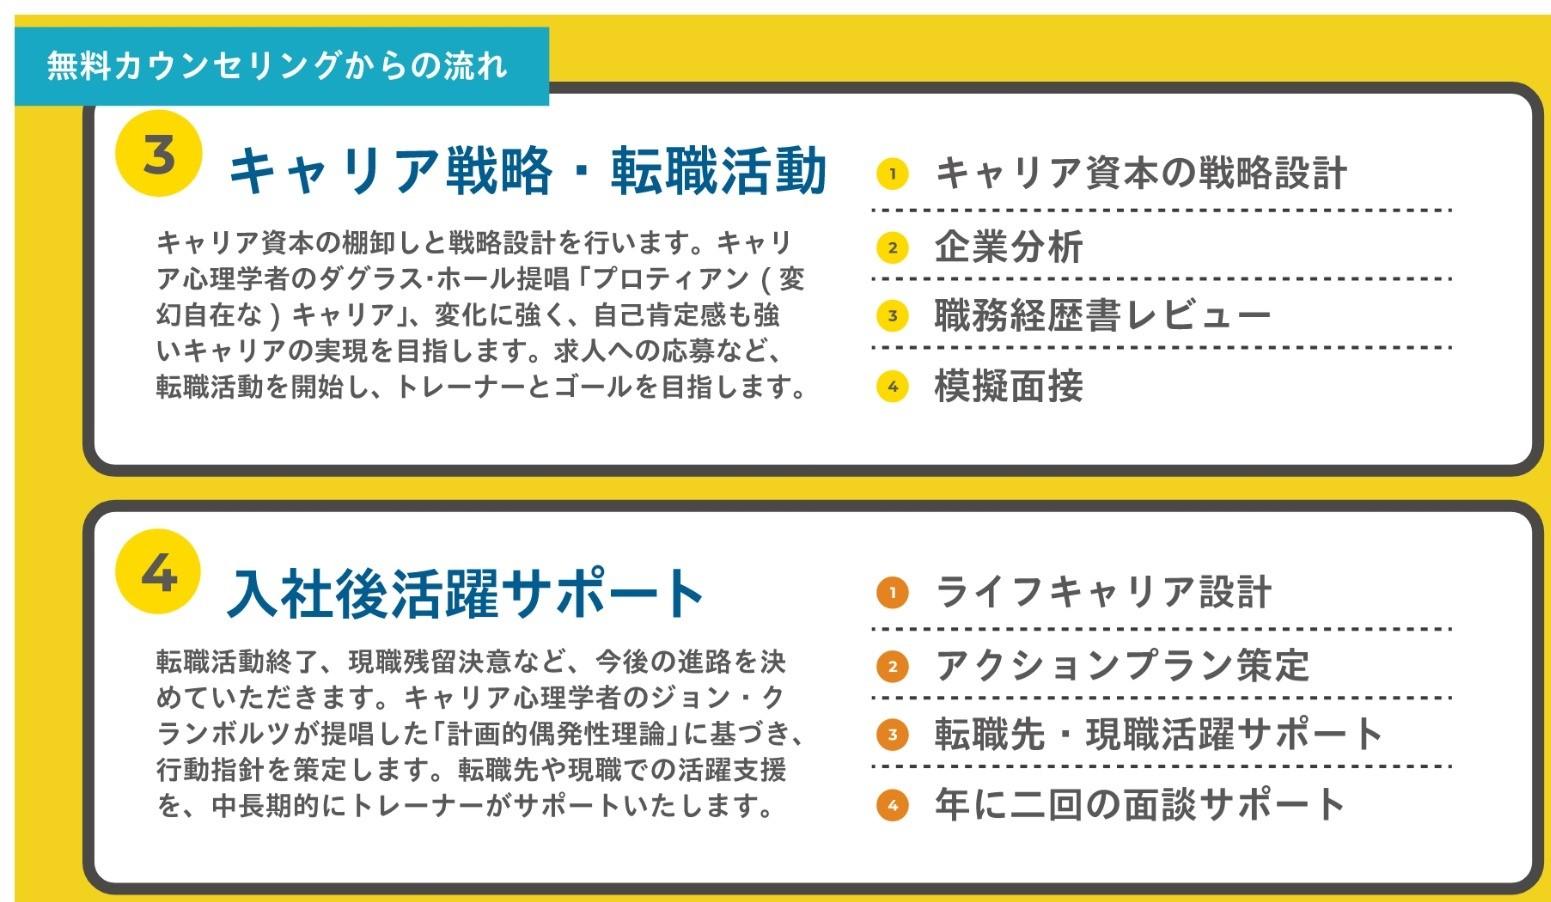 posiwill-career-program-②